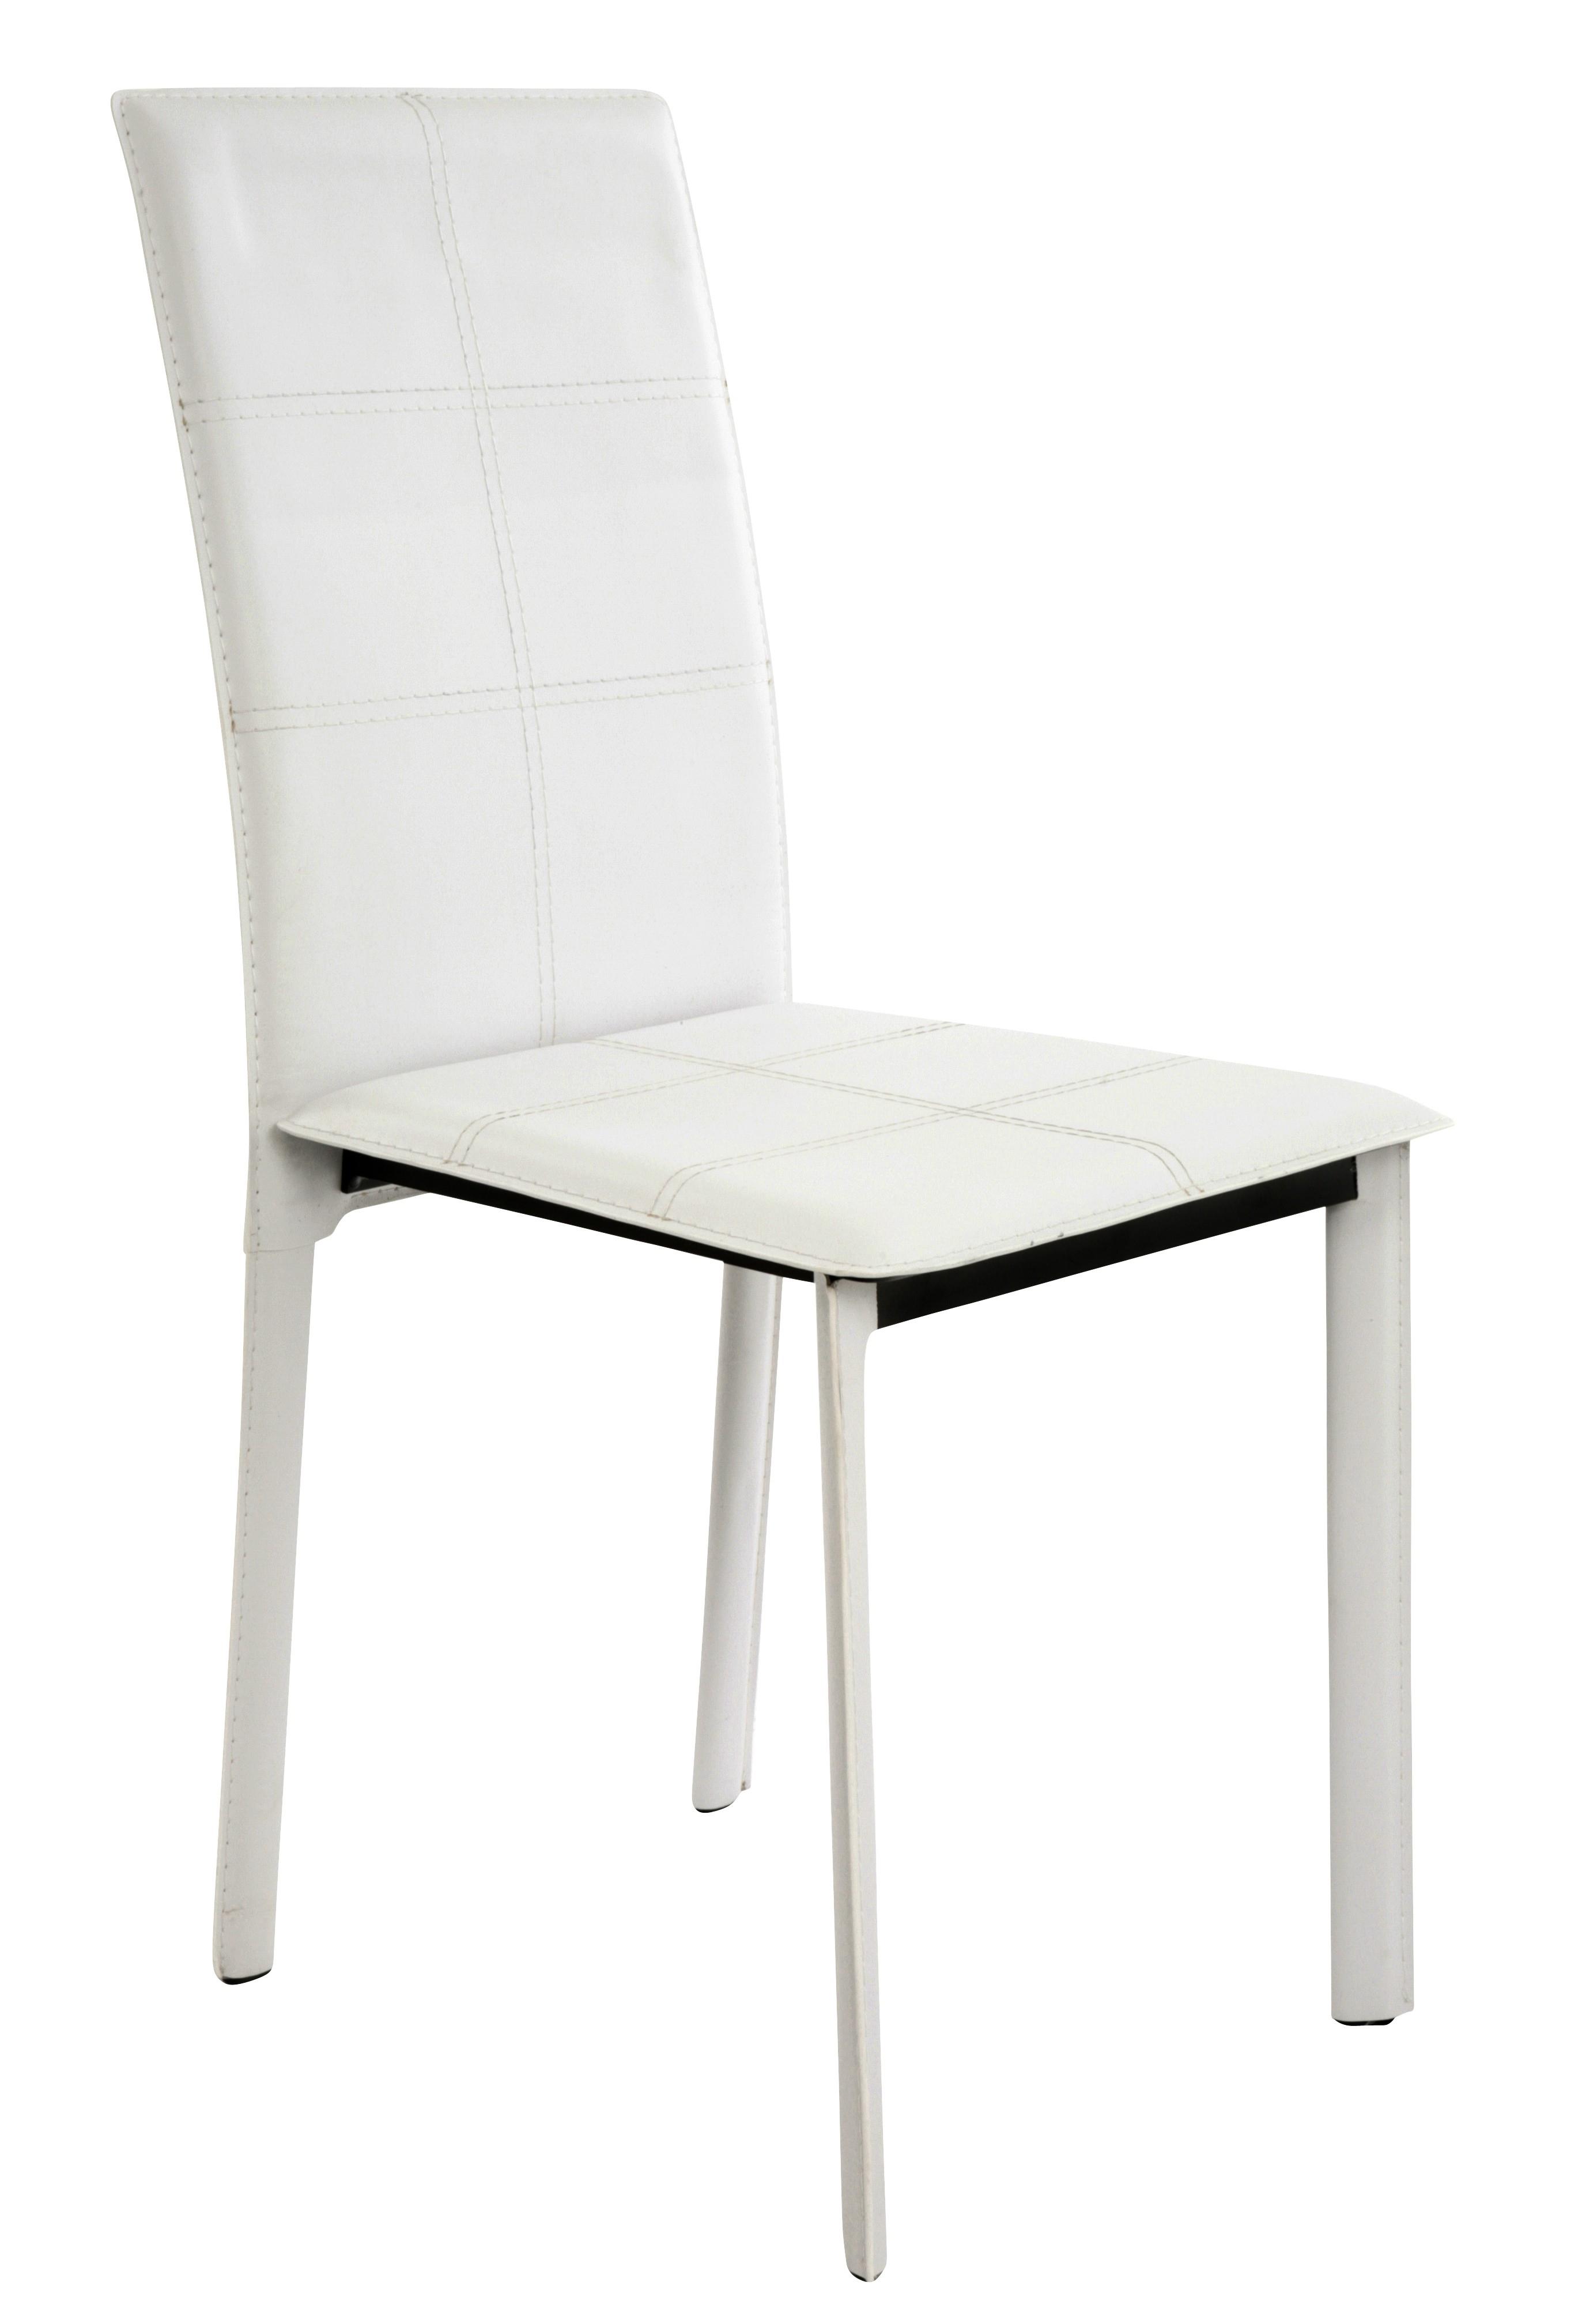 chaise pvc blanc games. Black Bedroom Furniture Sets. Home Design Ideas